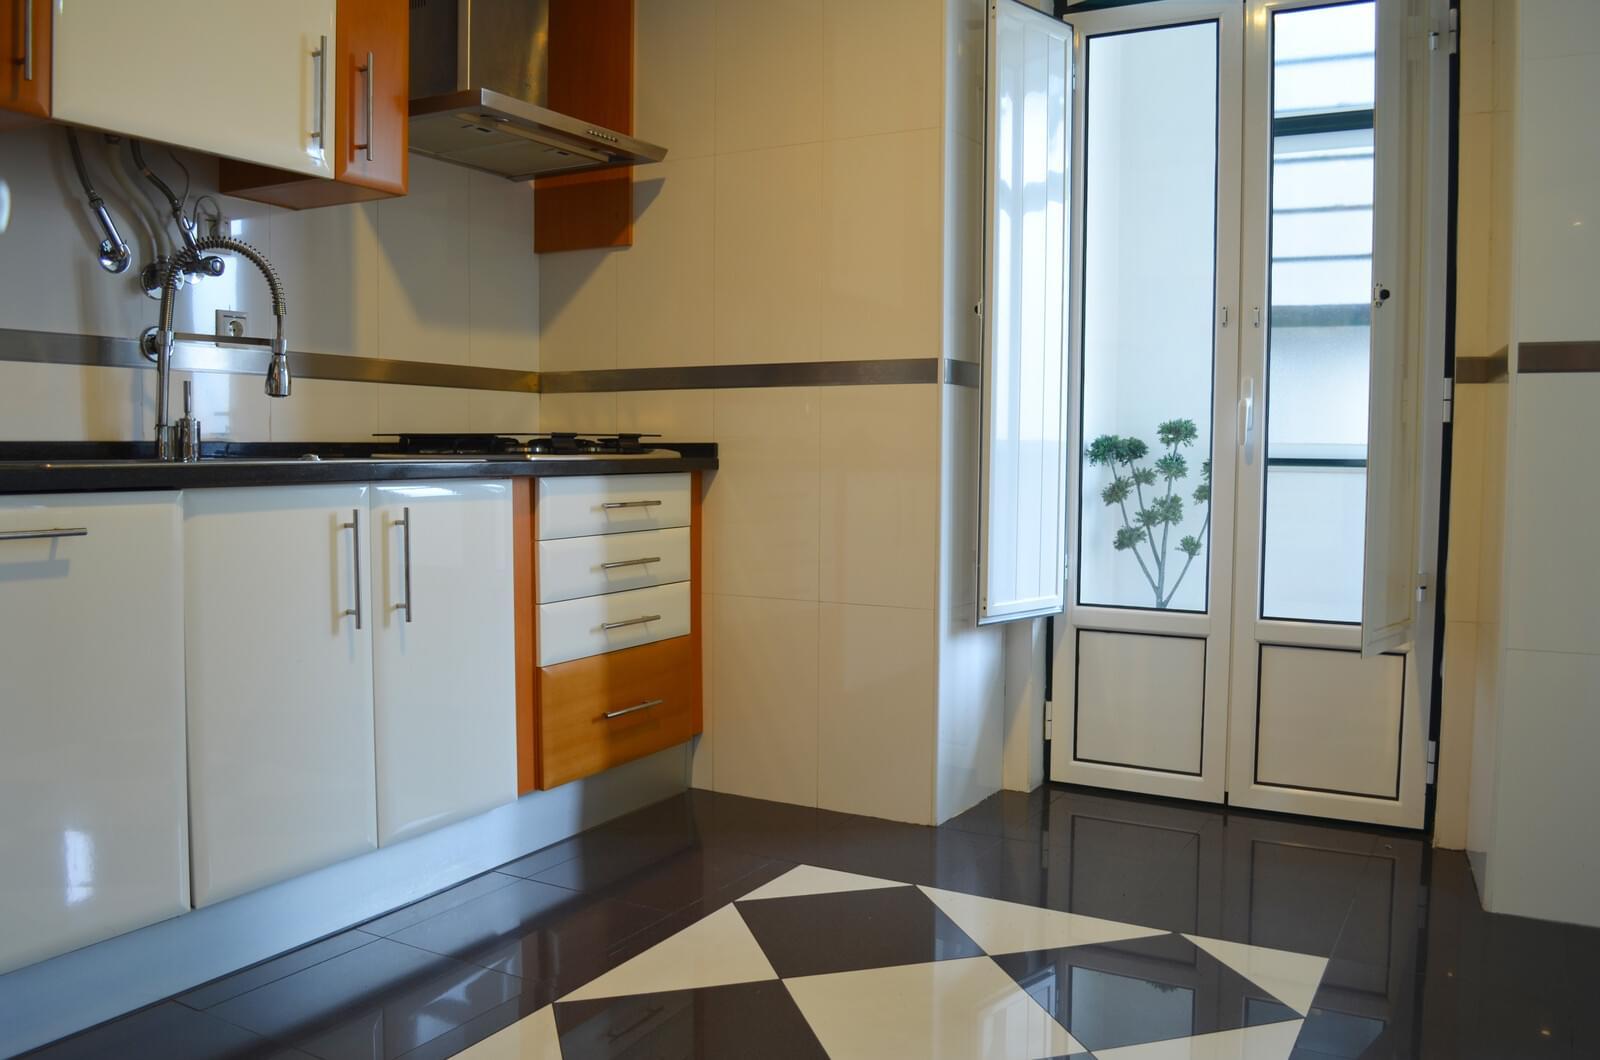 pf18839-apartamento-t2-lisboa-fd46a8a6-2730-459c-b06b-1da32002f730